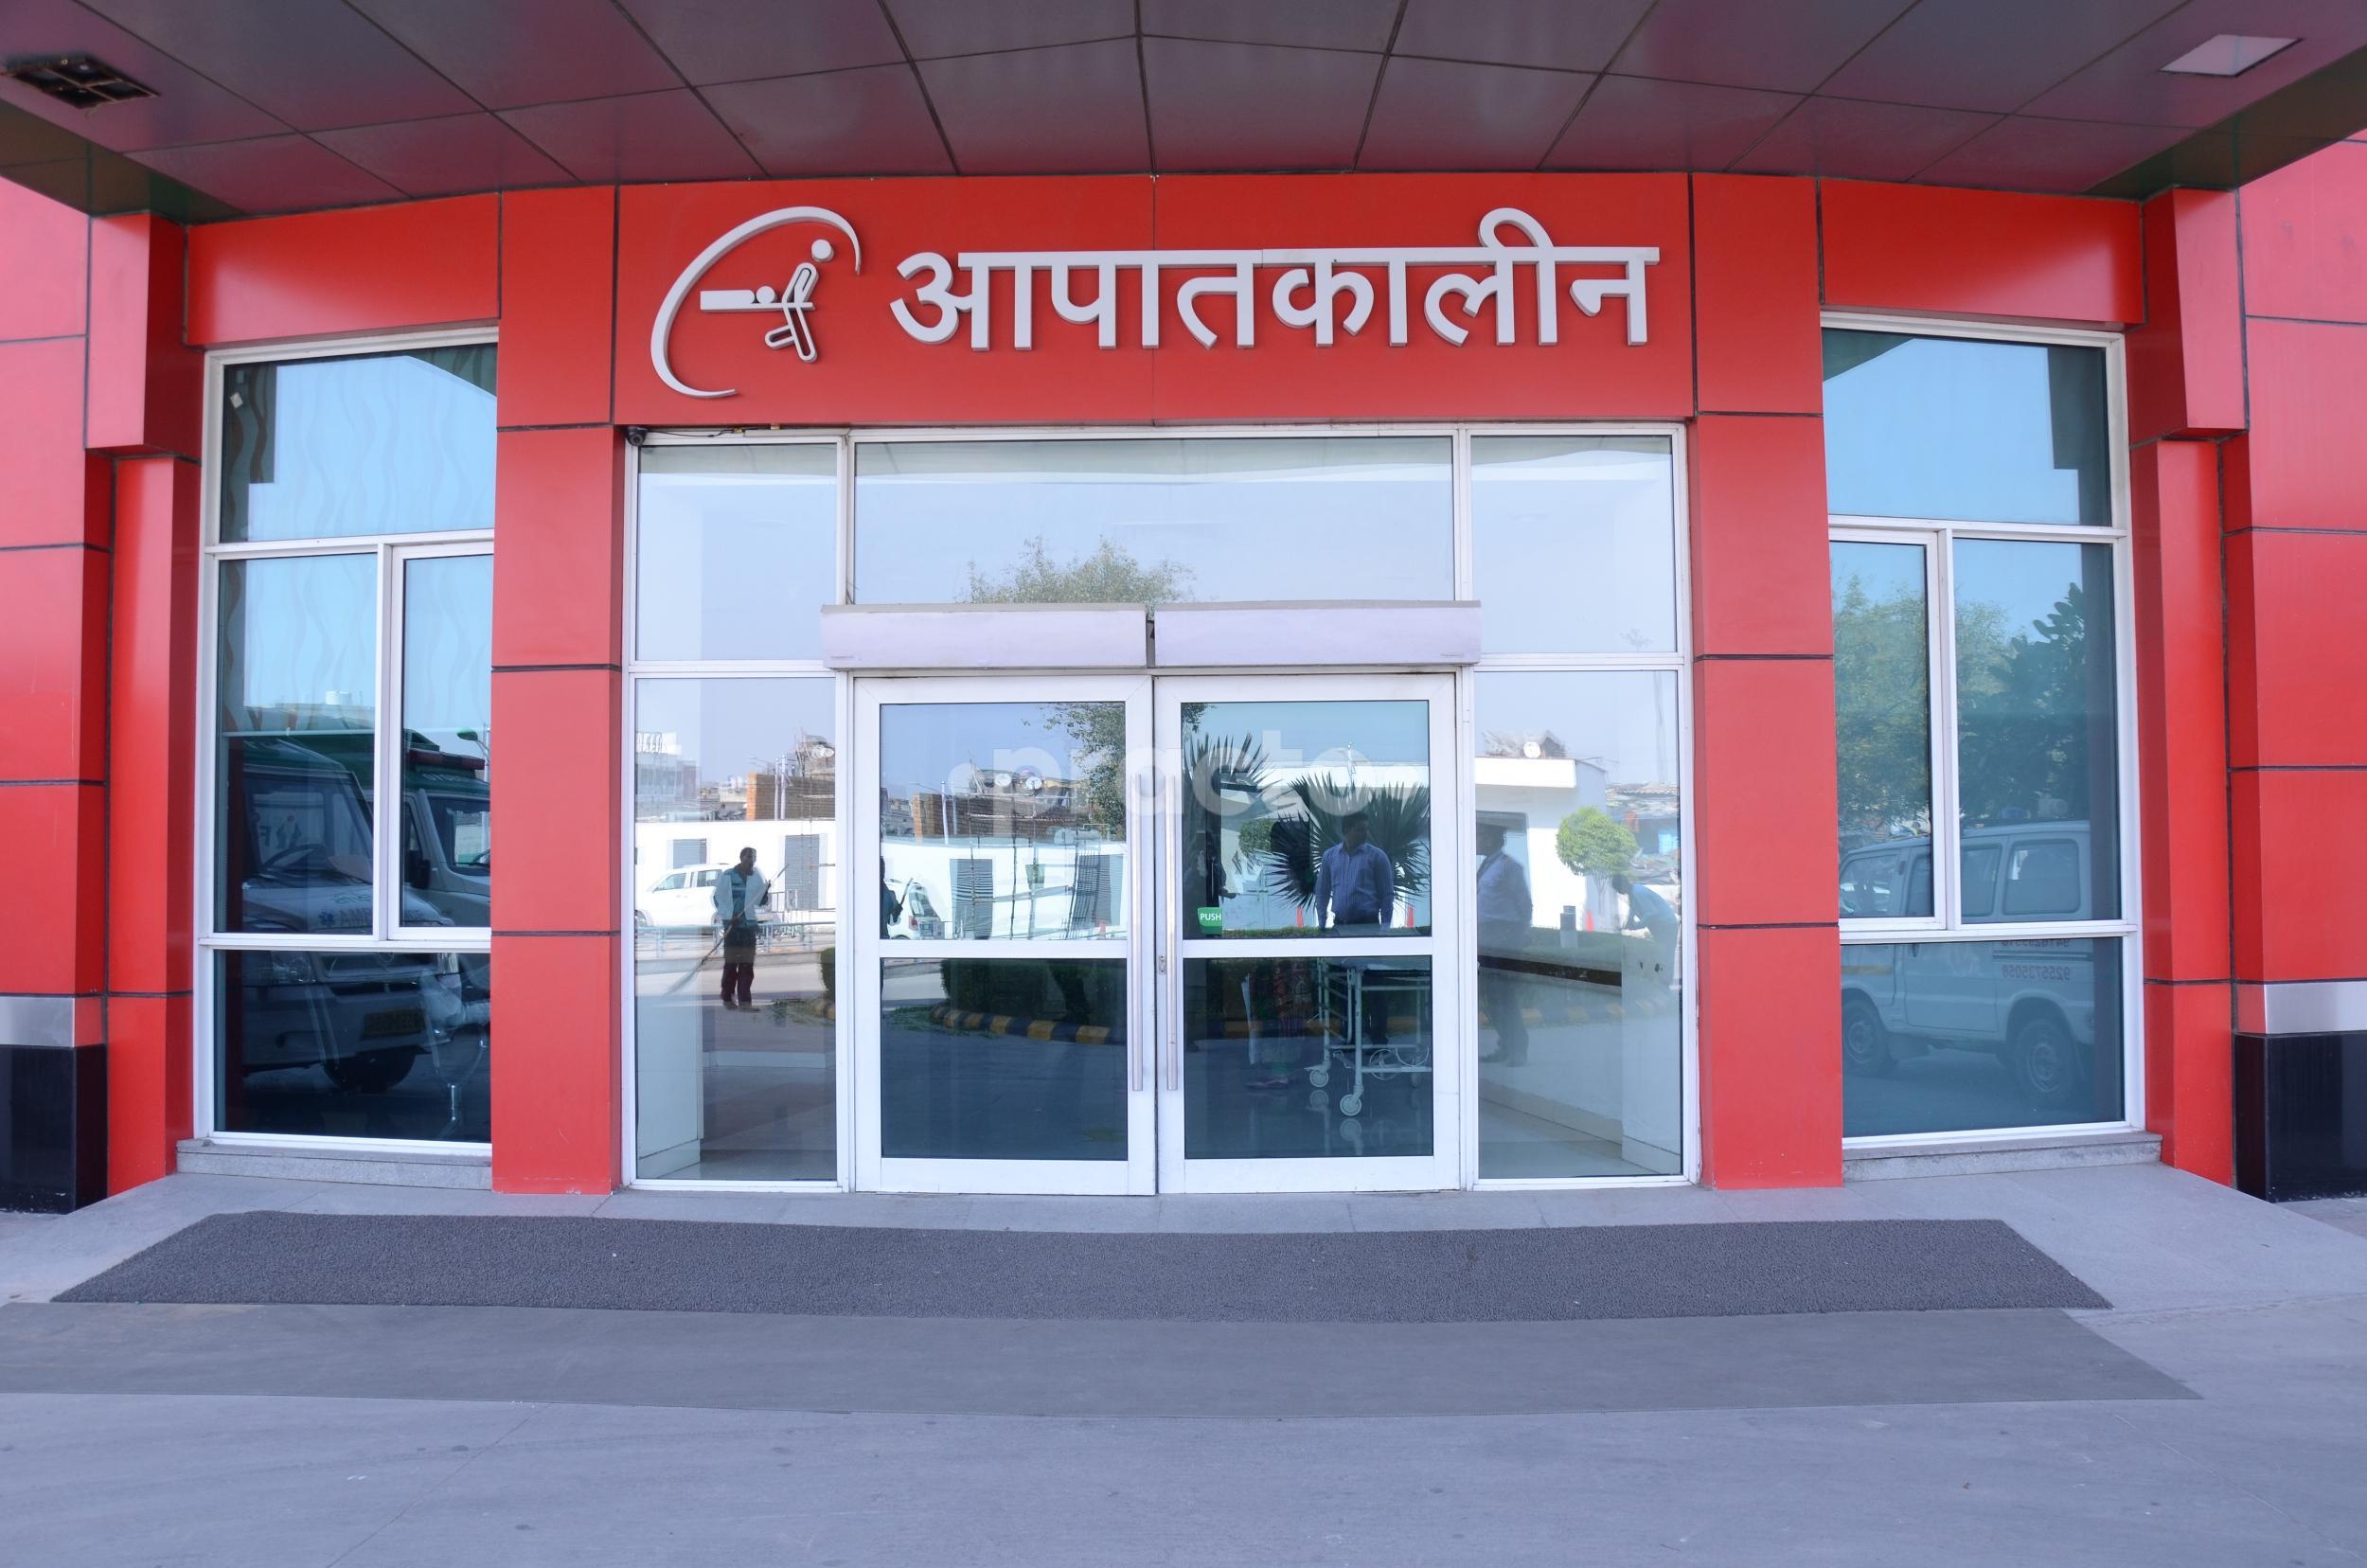 Nephrologists In Gujranwala Town, Delhi - Instant